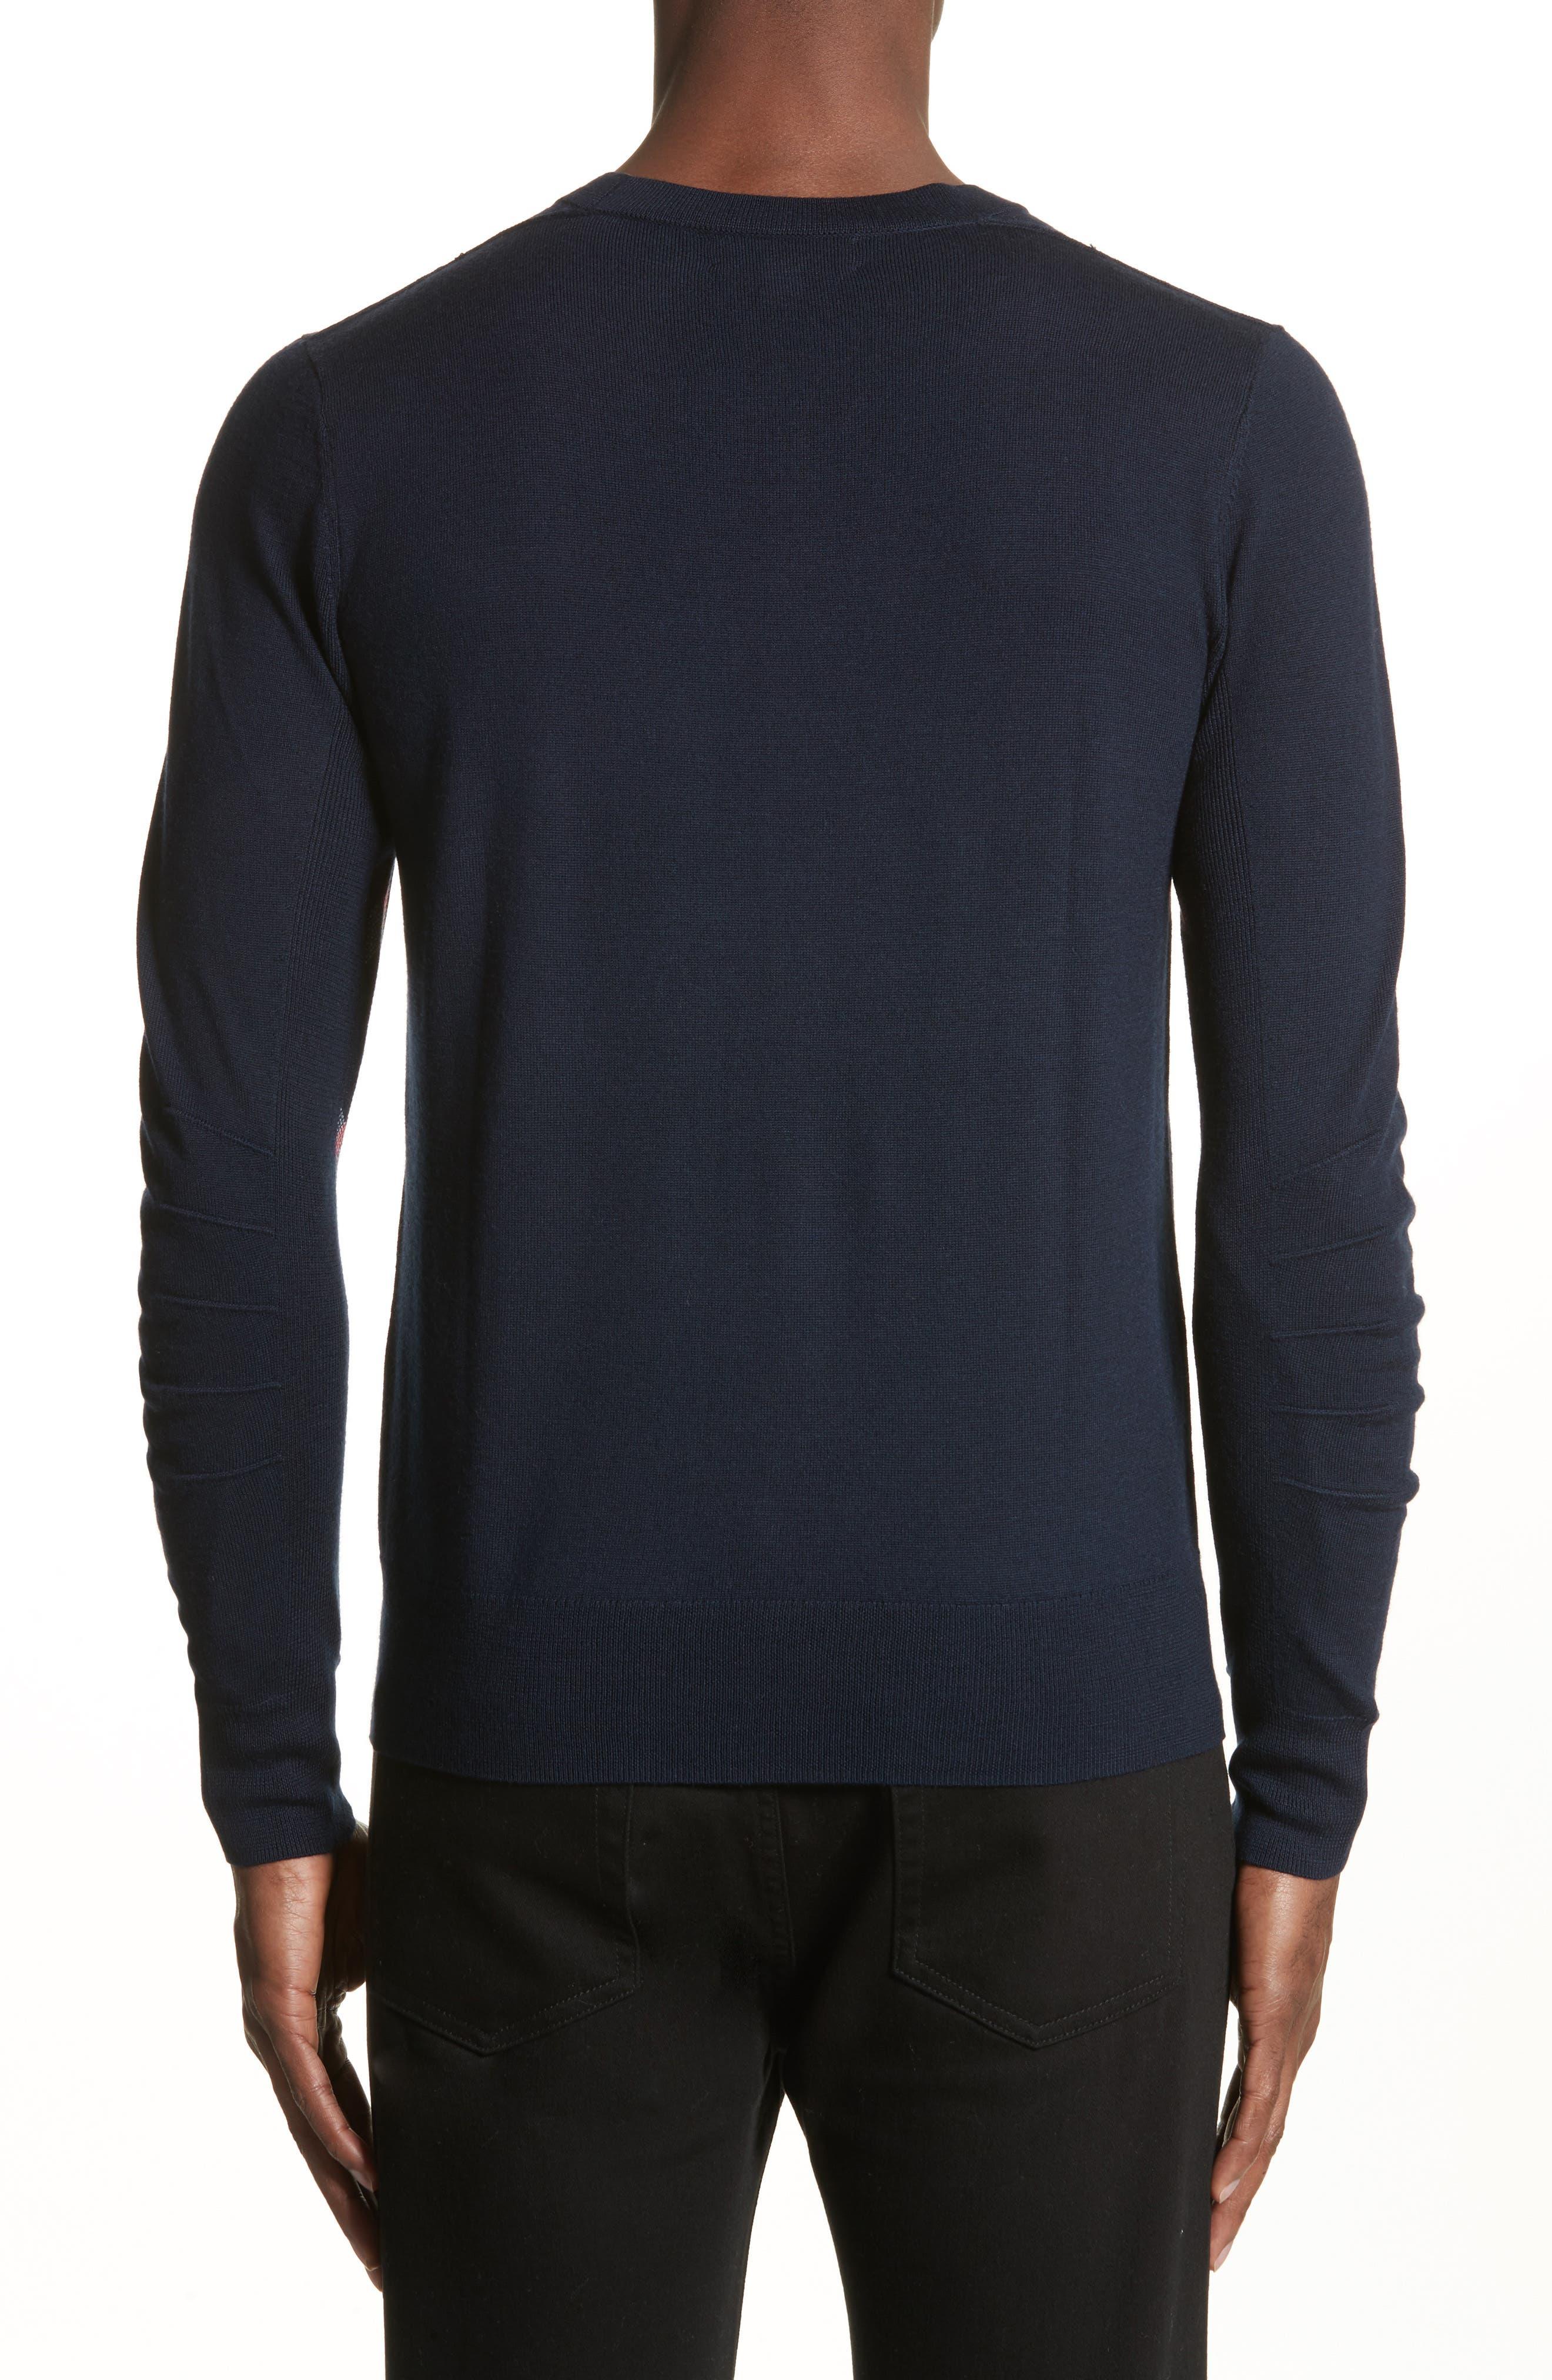 Carter Merino Wool Crewneck Sweater,                             Alternate thumbnail 6, color,